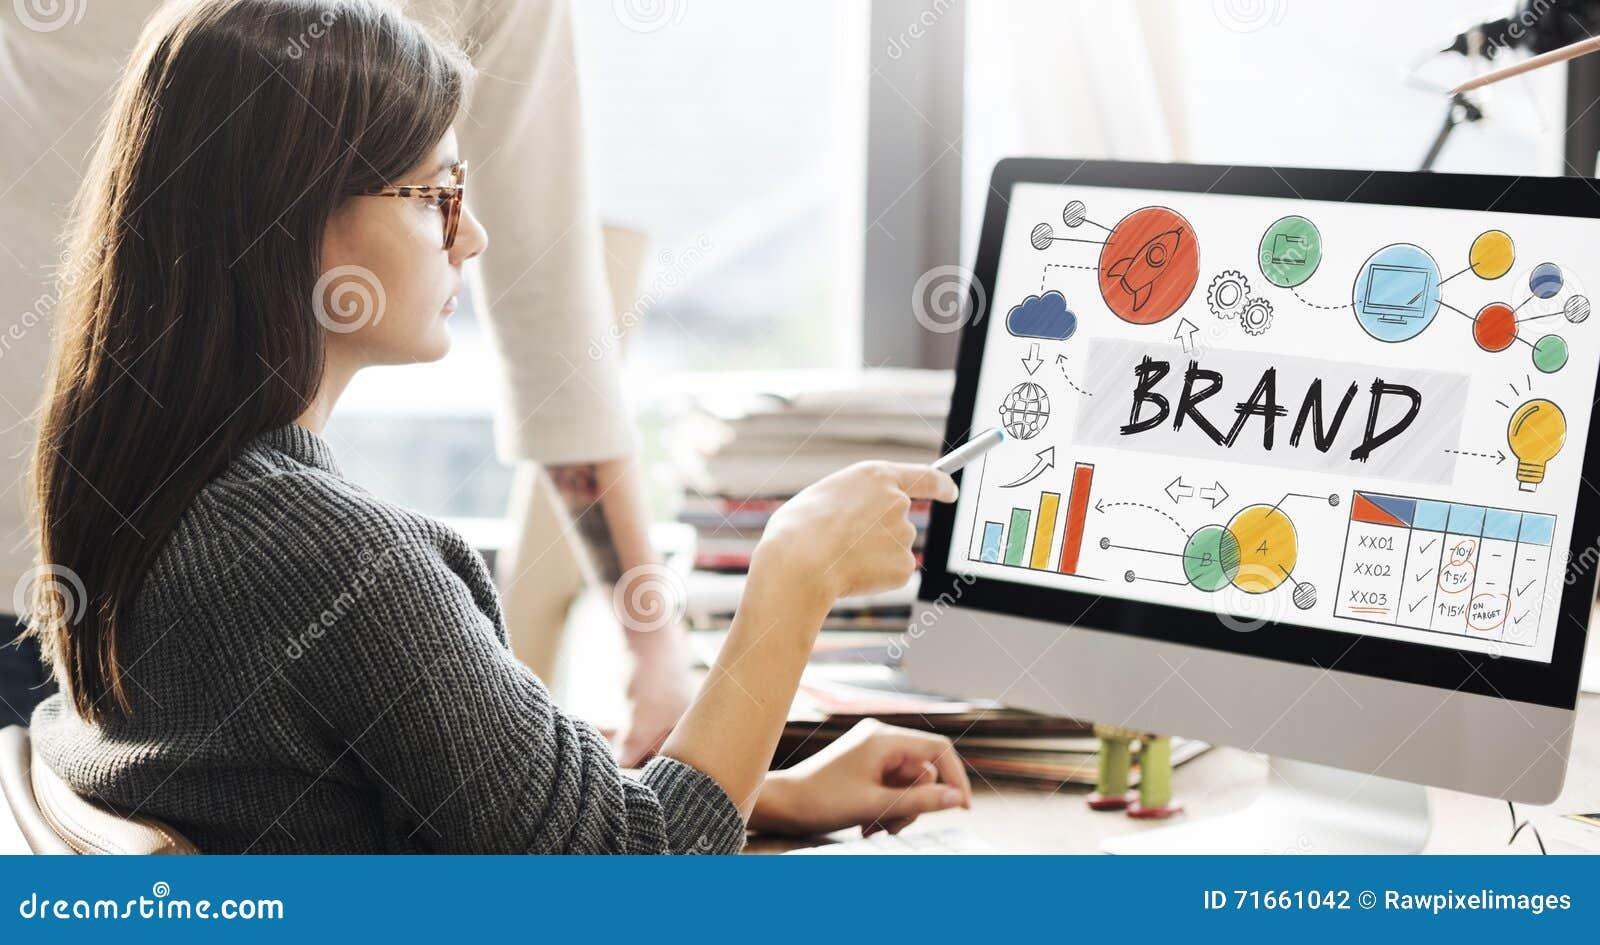 Brand Branding Advertising Trademark Marketing Concept